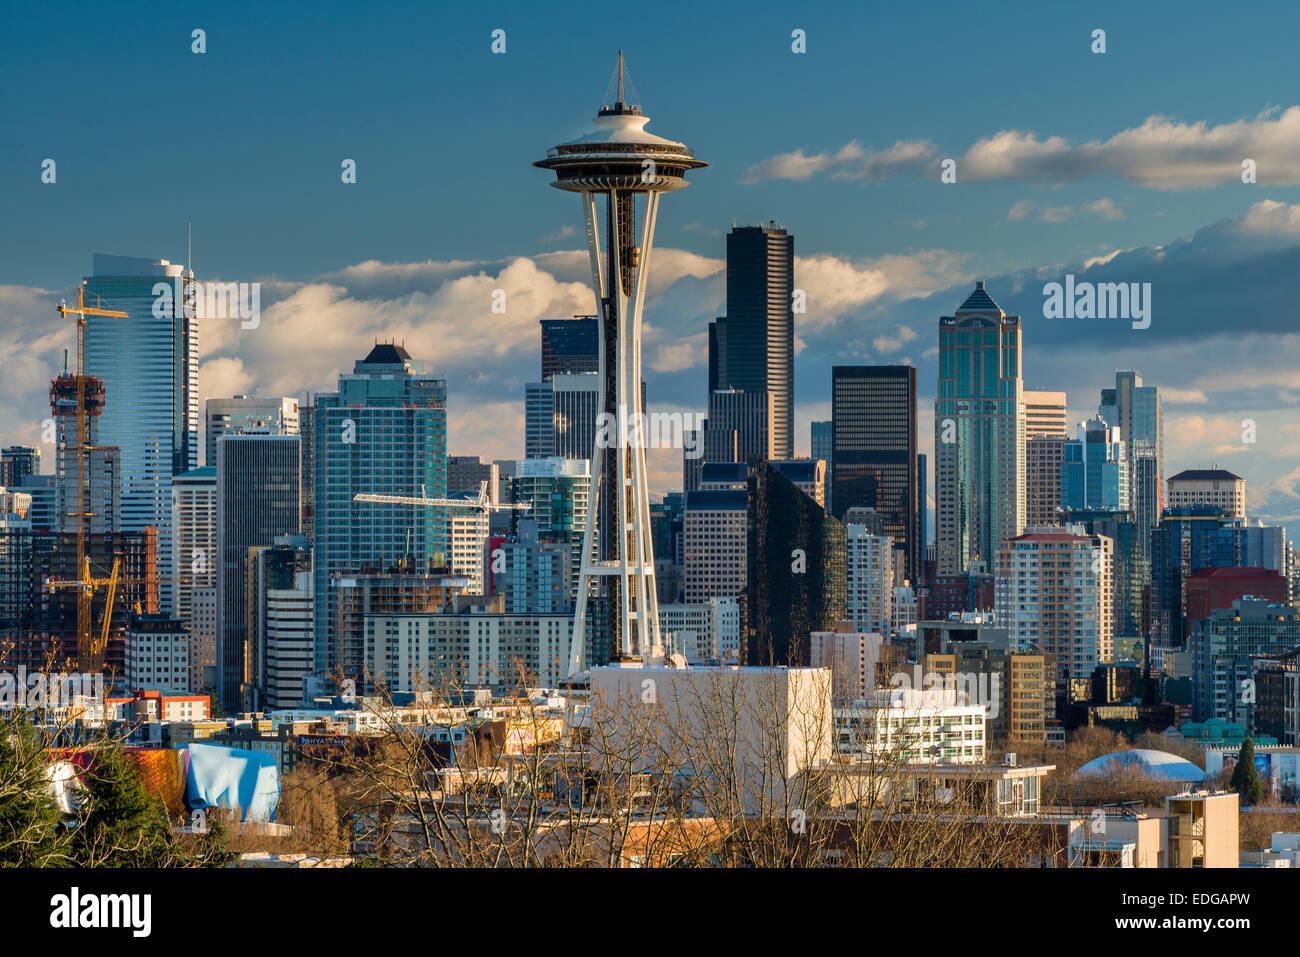 Le centre-ville avec Space Needle, Seattle, Washington, USA Photo Stock